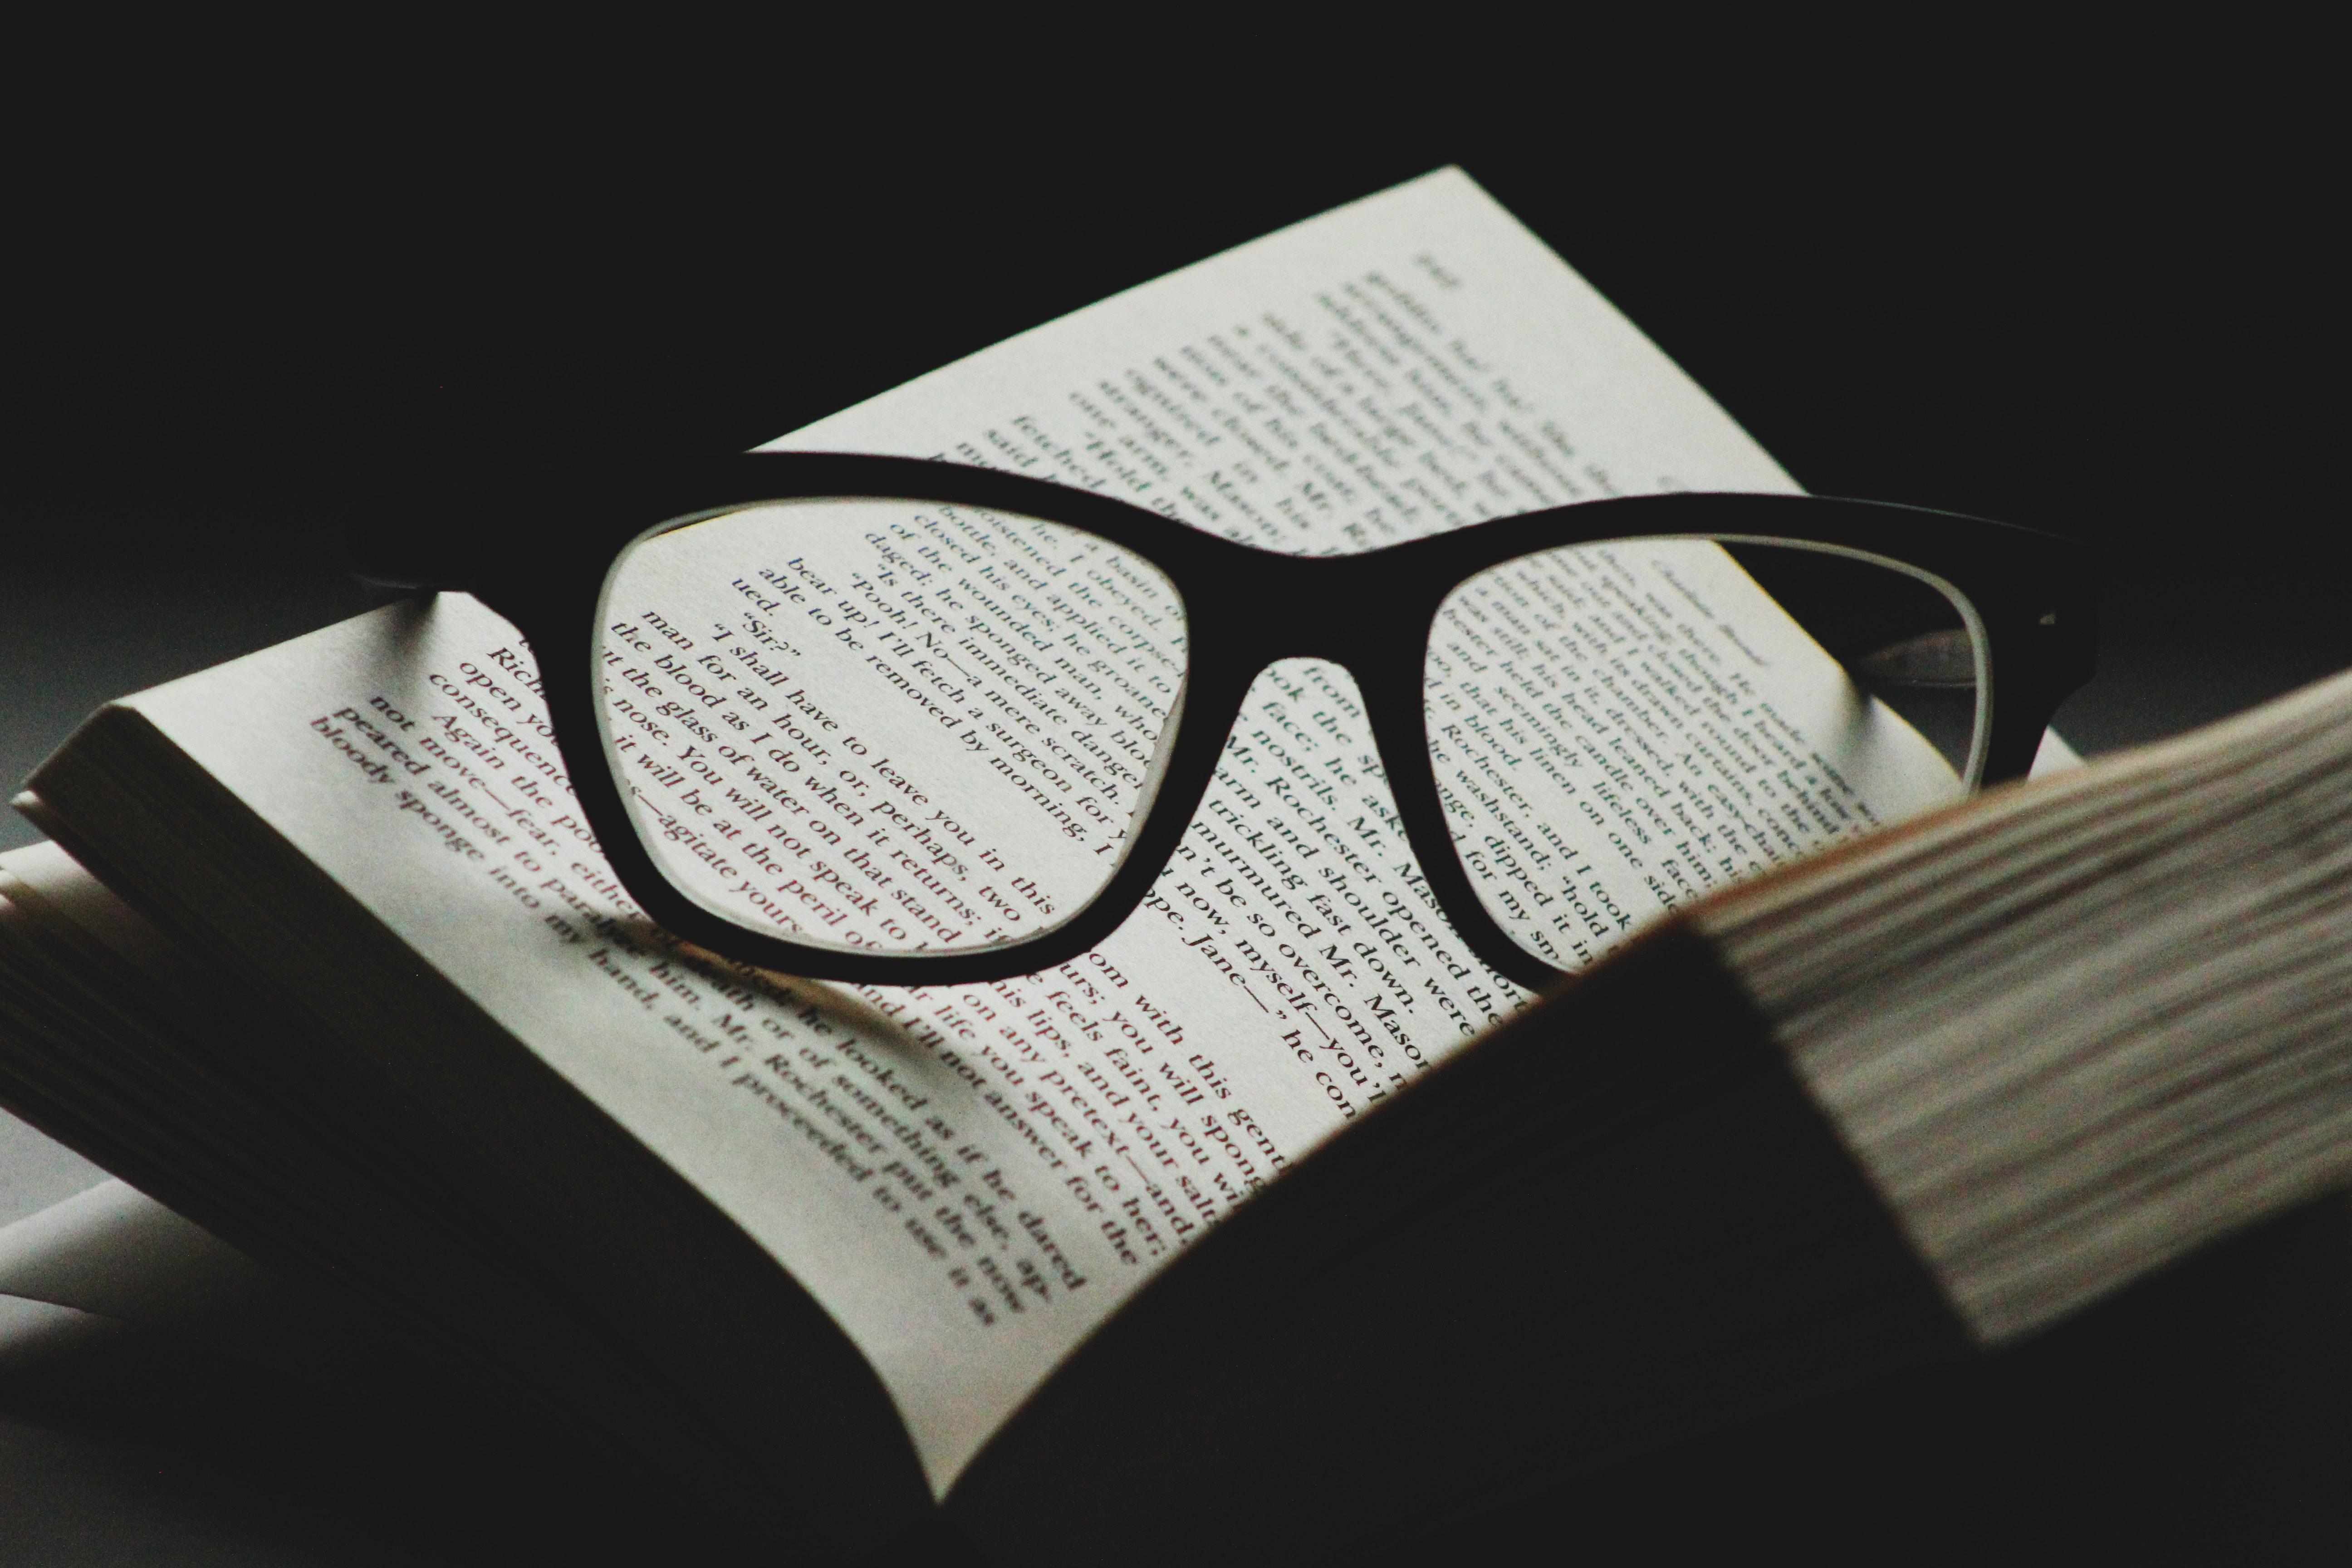 black framed eyeglasses on top of open book